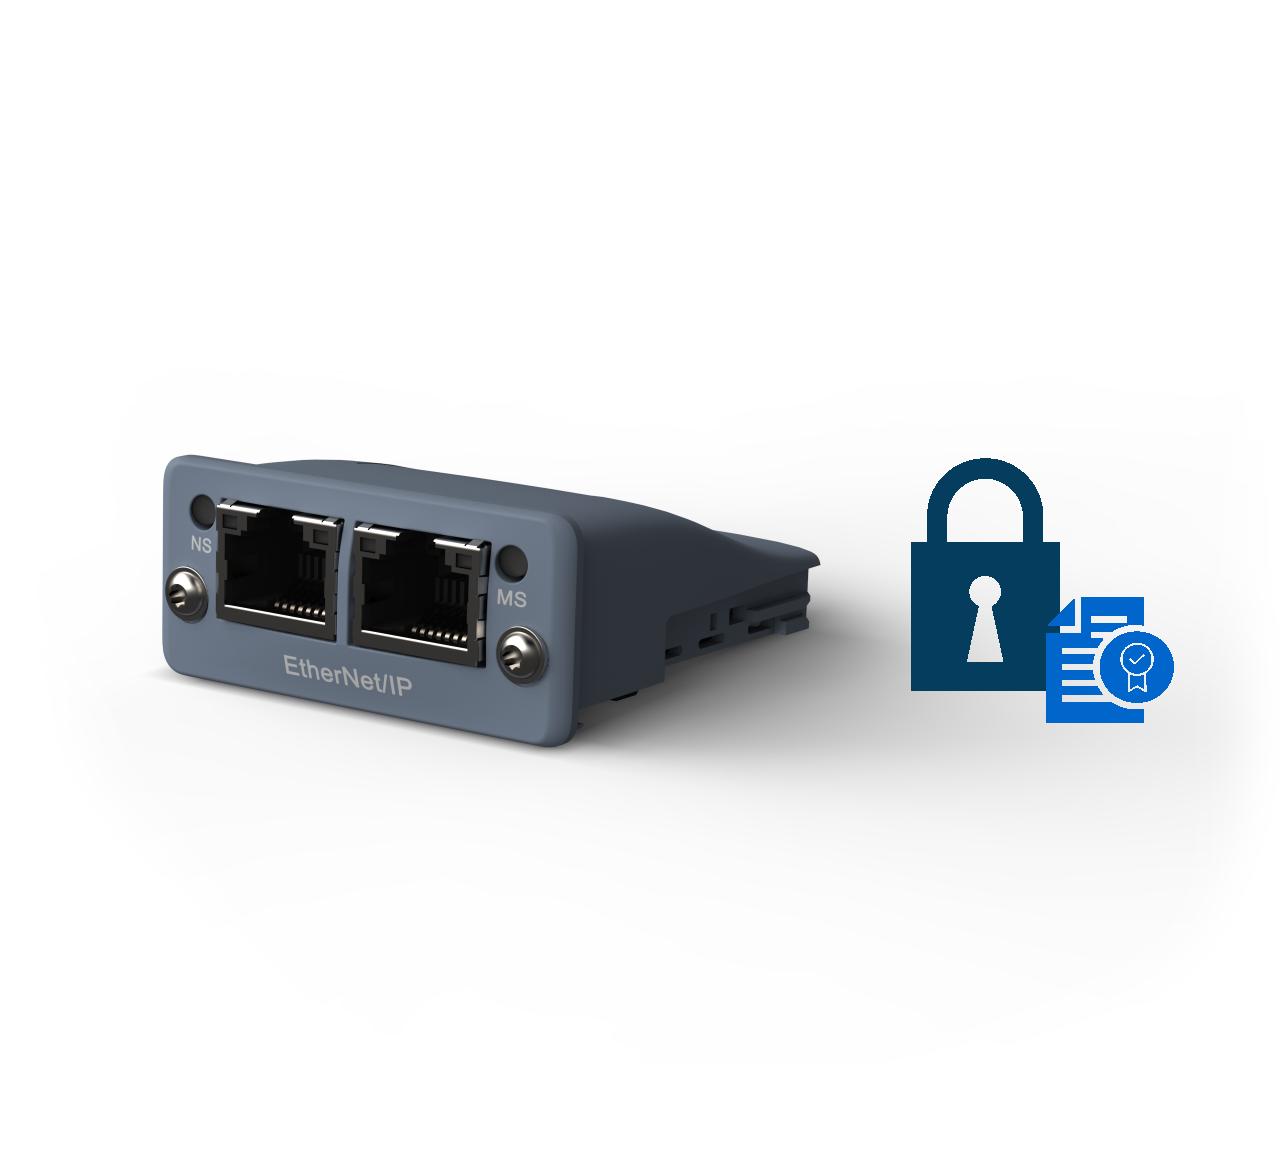 abcc-security-platform-illustration